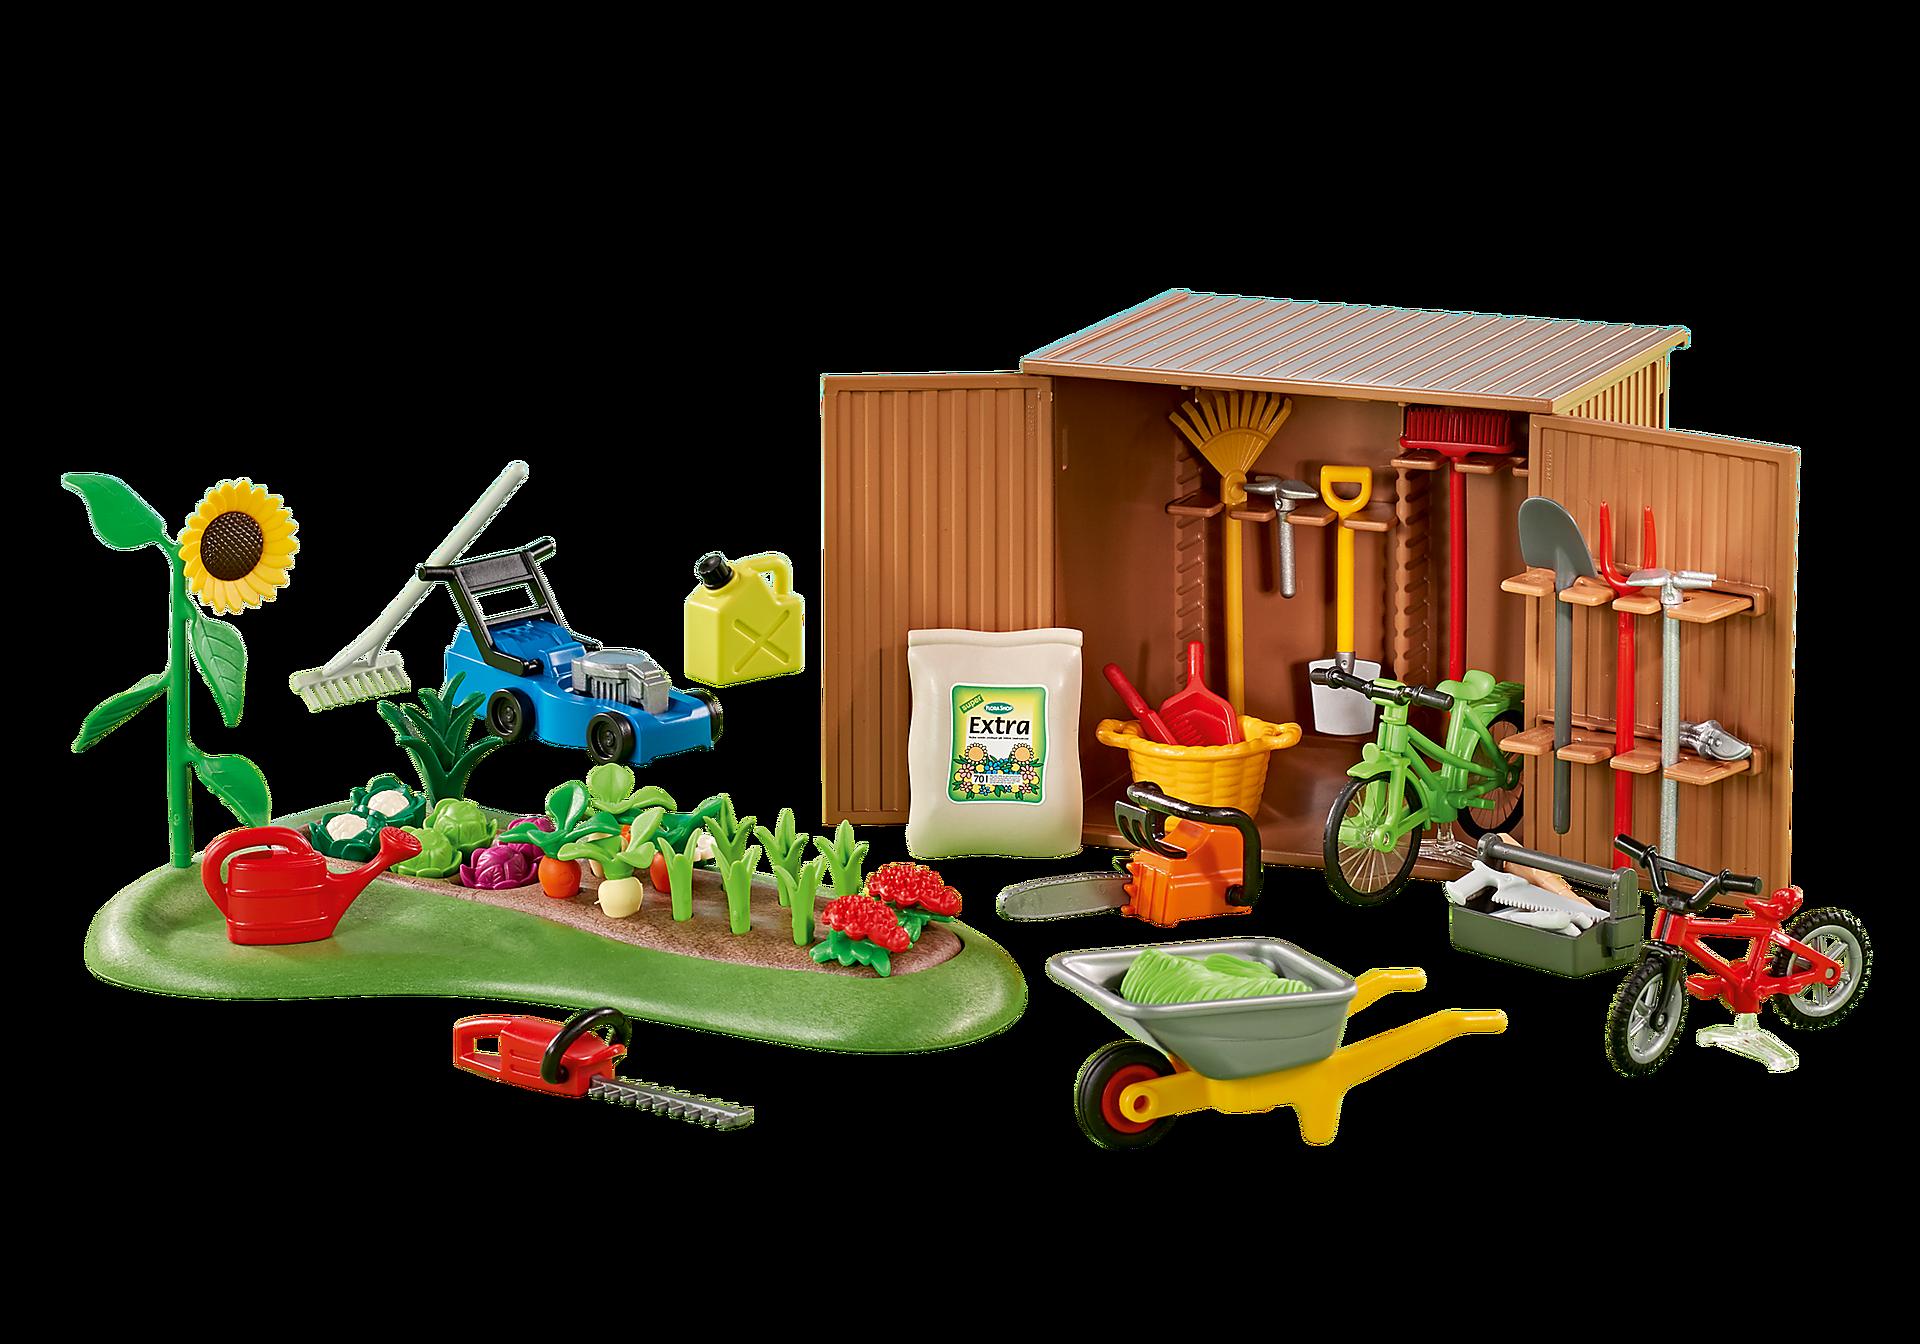 http://media.playmobil.com/i/playmobil/6558_product_detail/Αποθήκη εργαλείων και μποστάνι λαχανικών